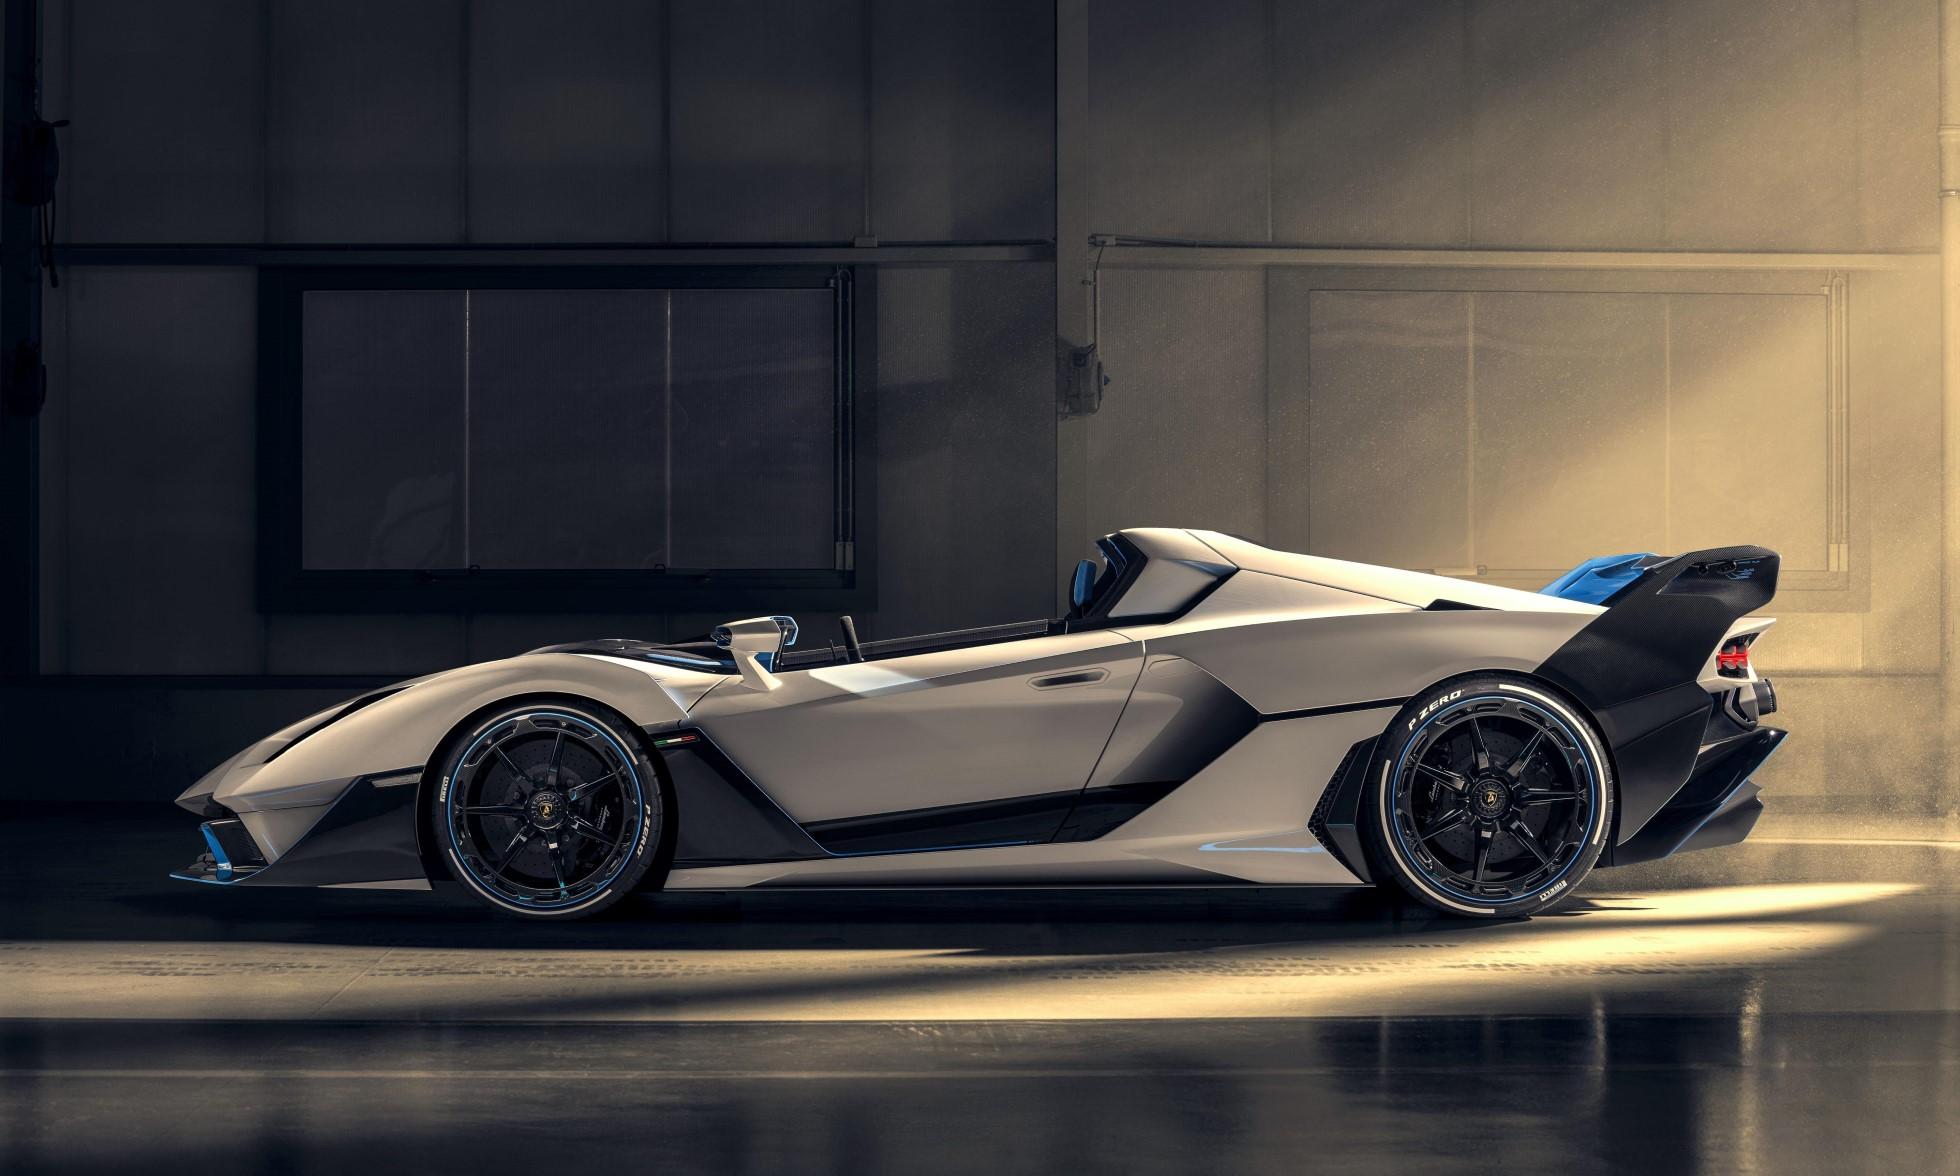 Lamborghini SC20 profile